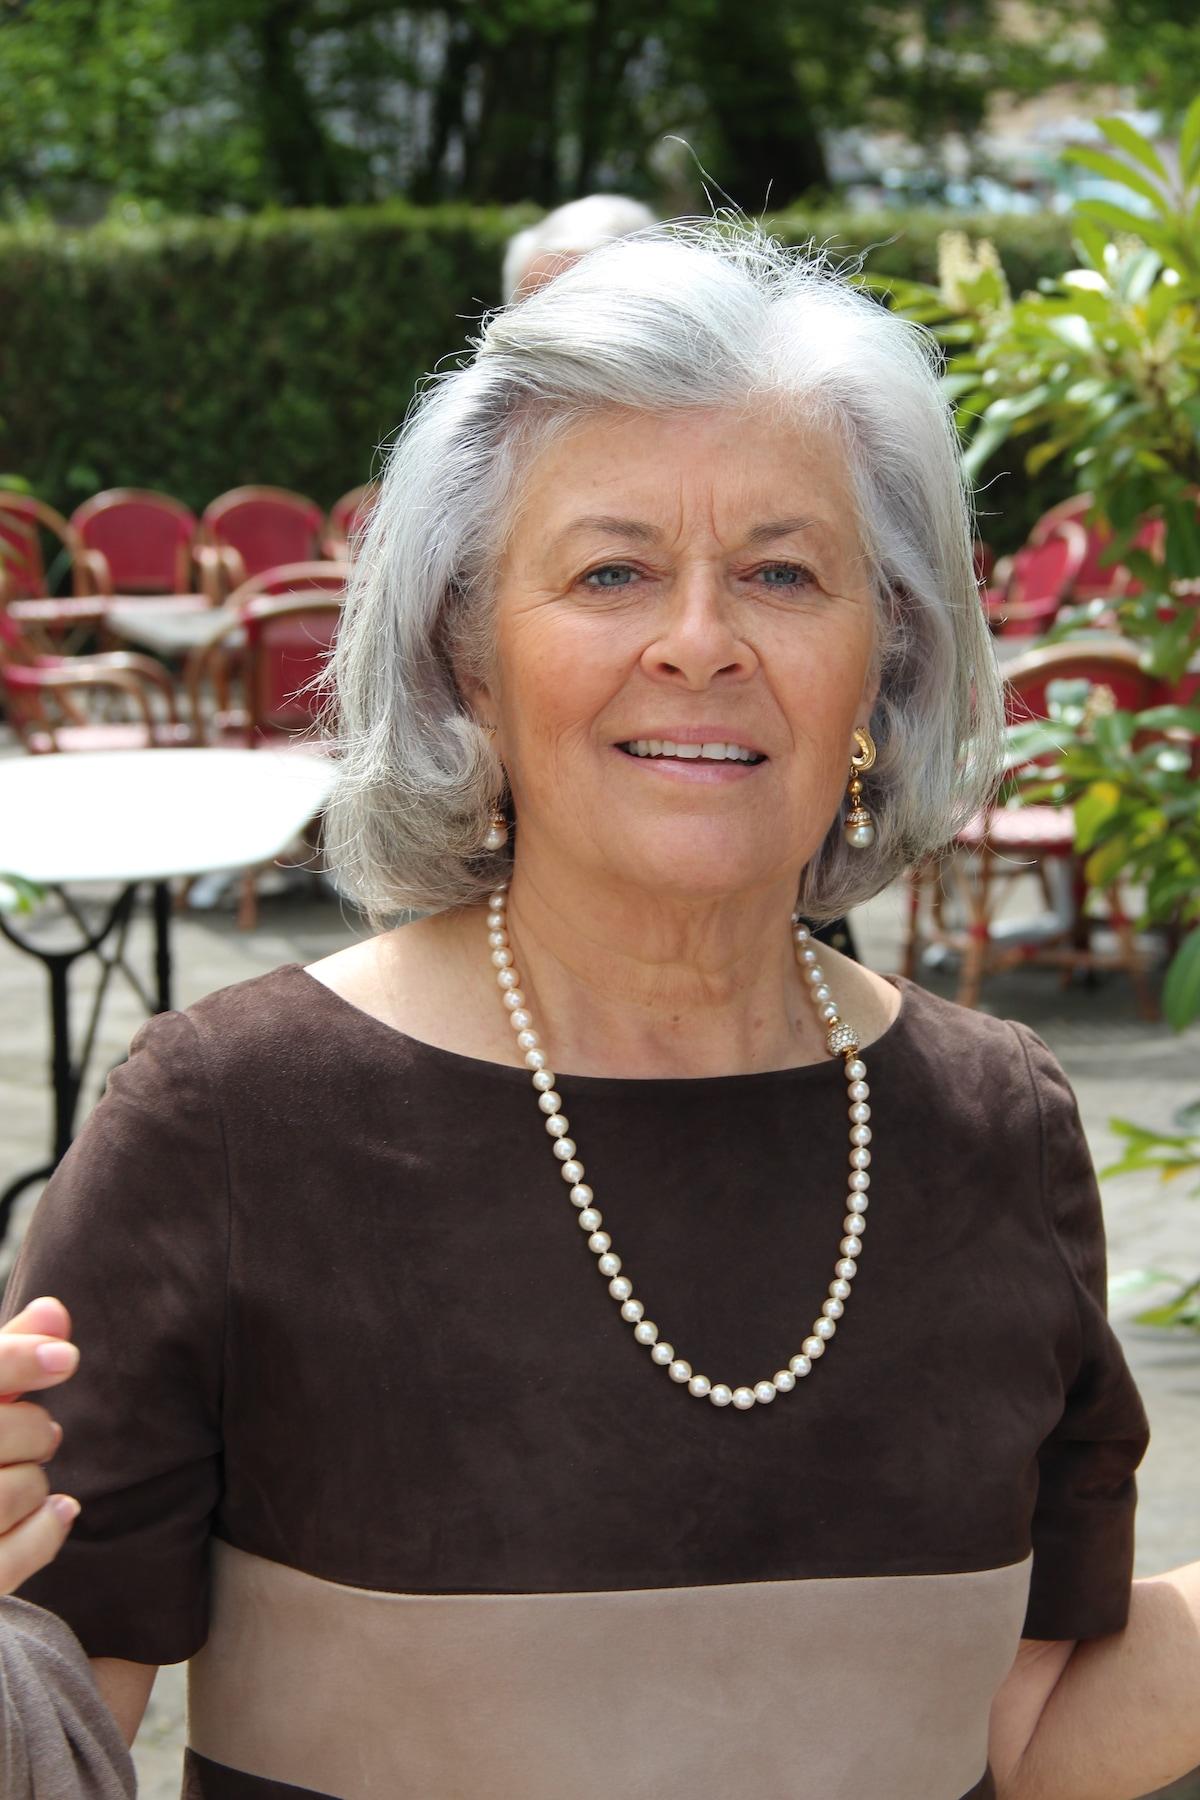 Fabienne from Val d'Illiez